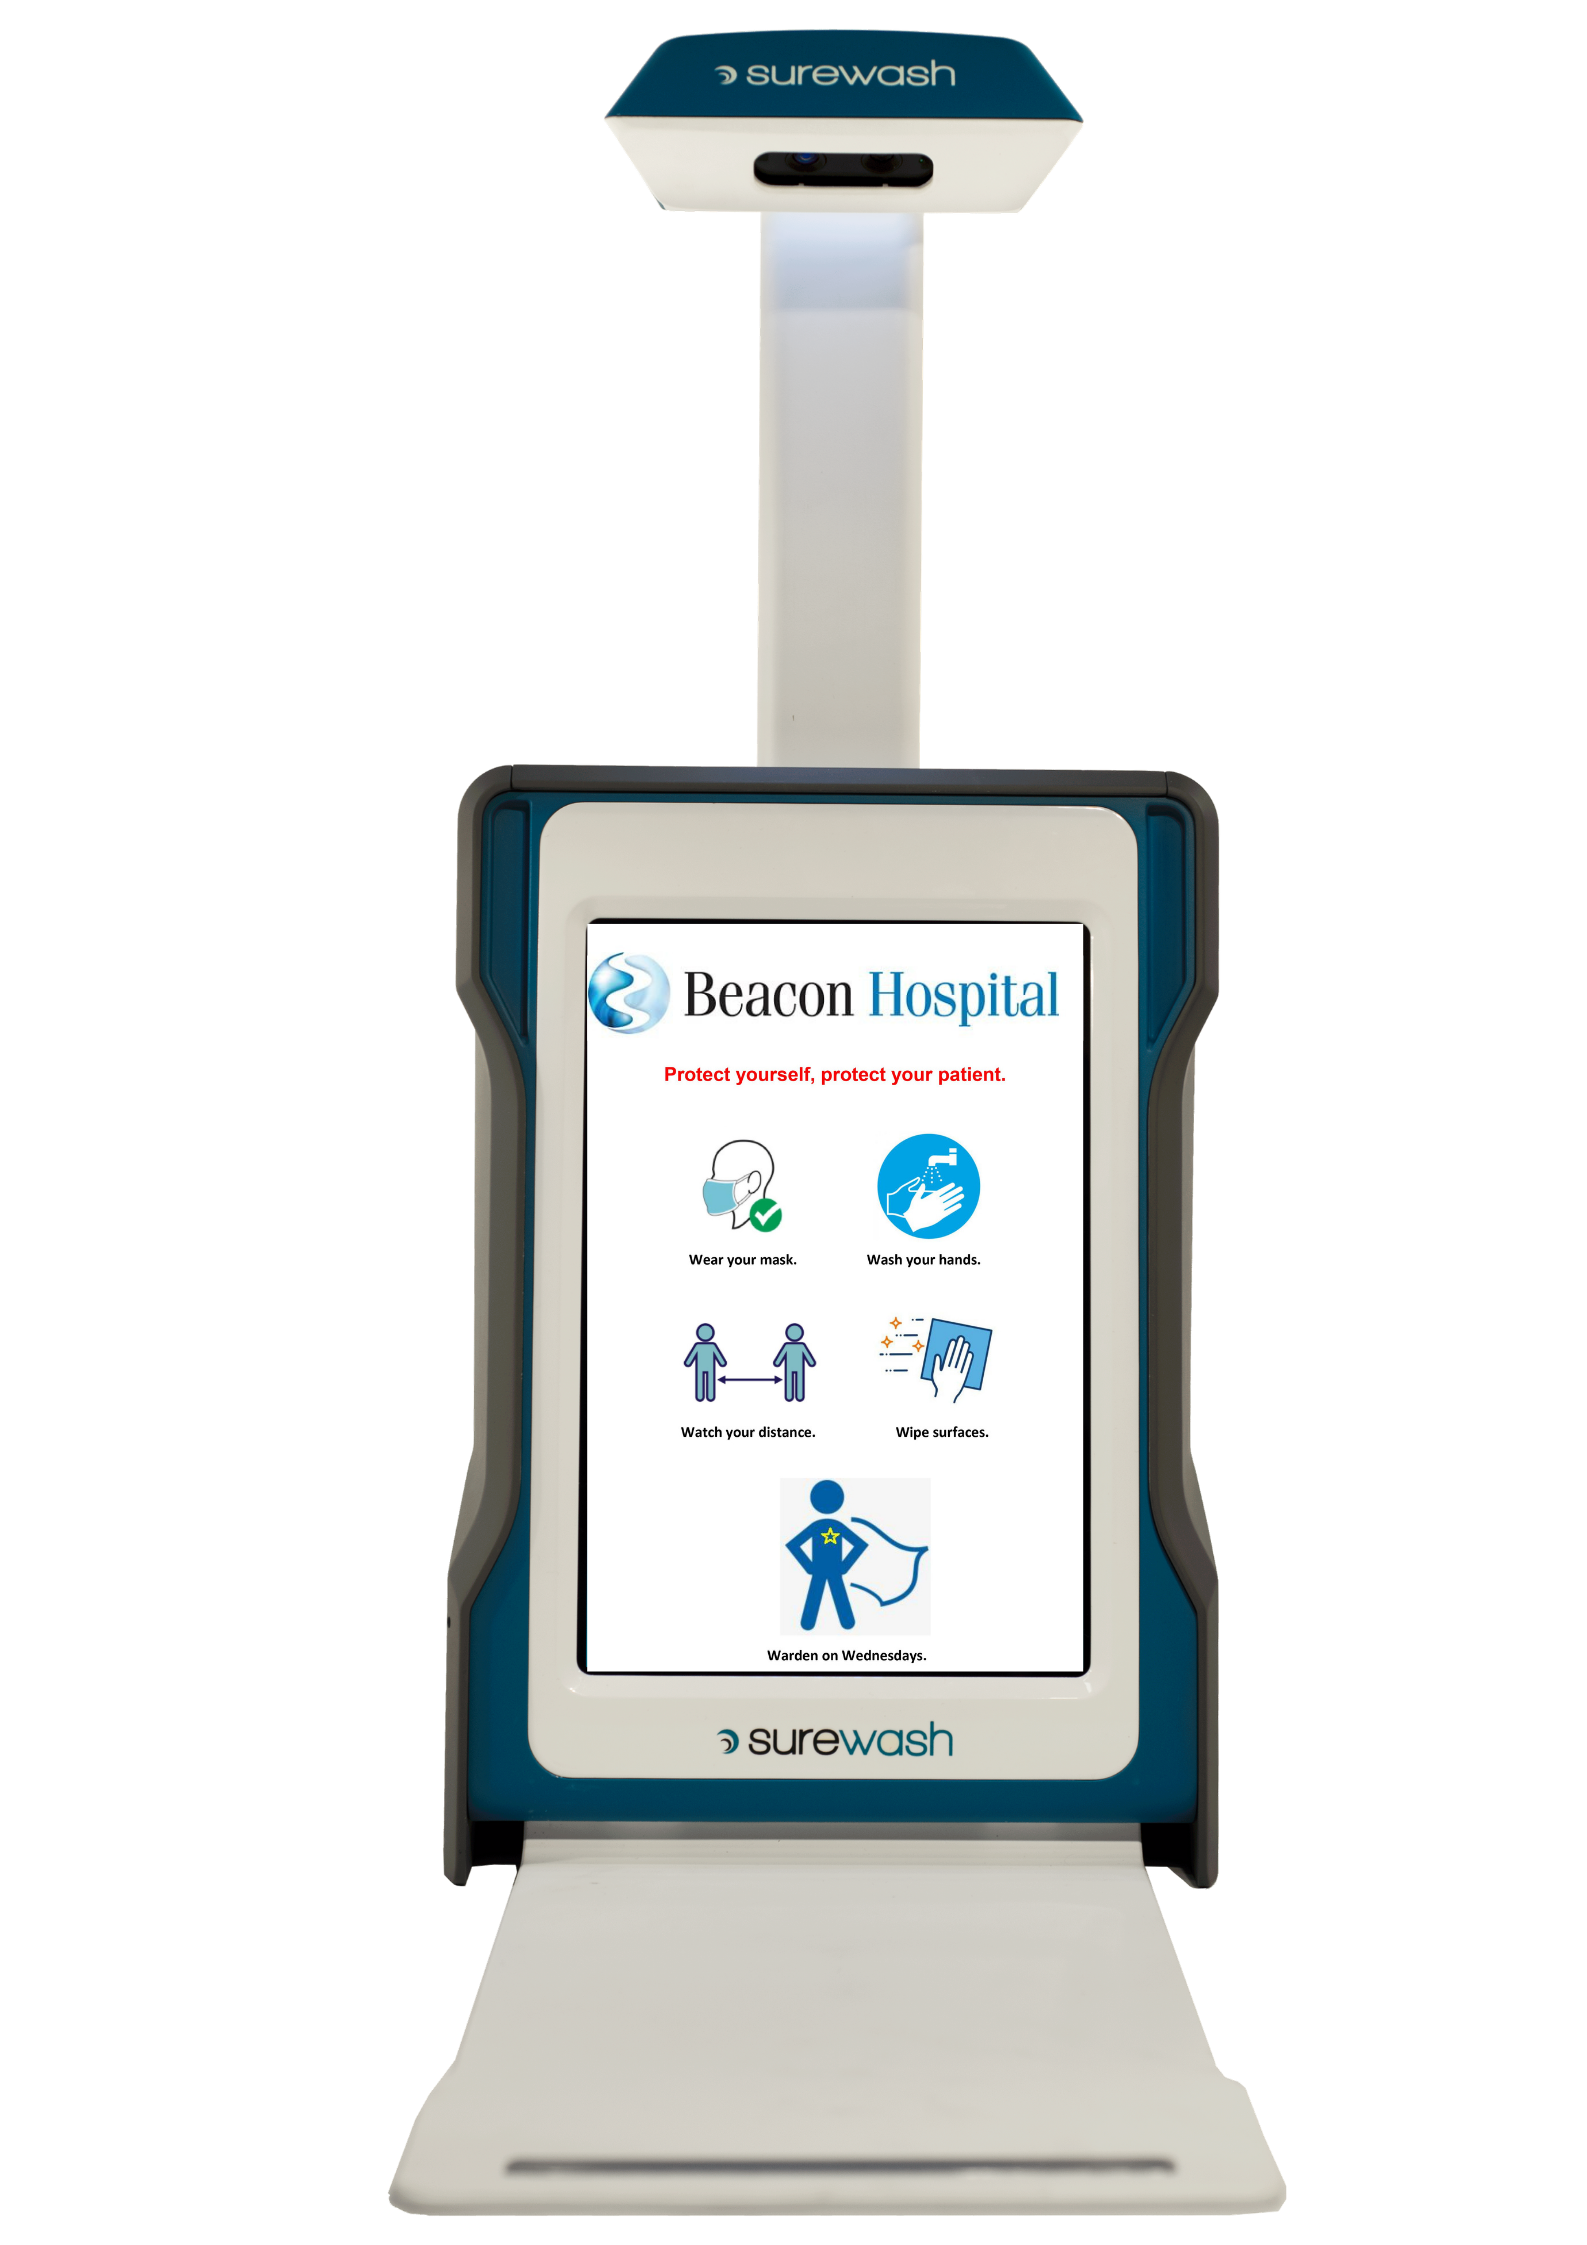 beacon-hospital-hand-hygiene-training-surewash